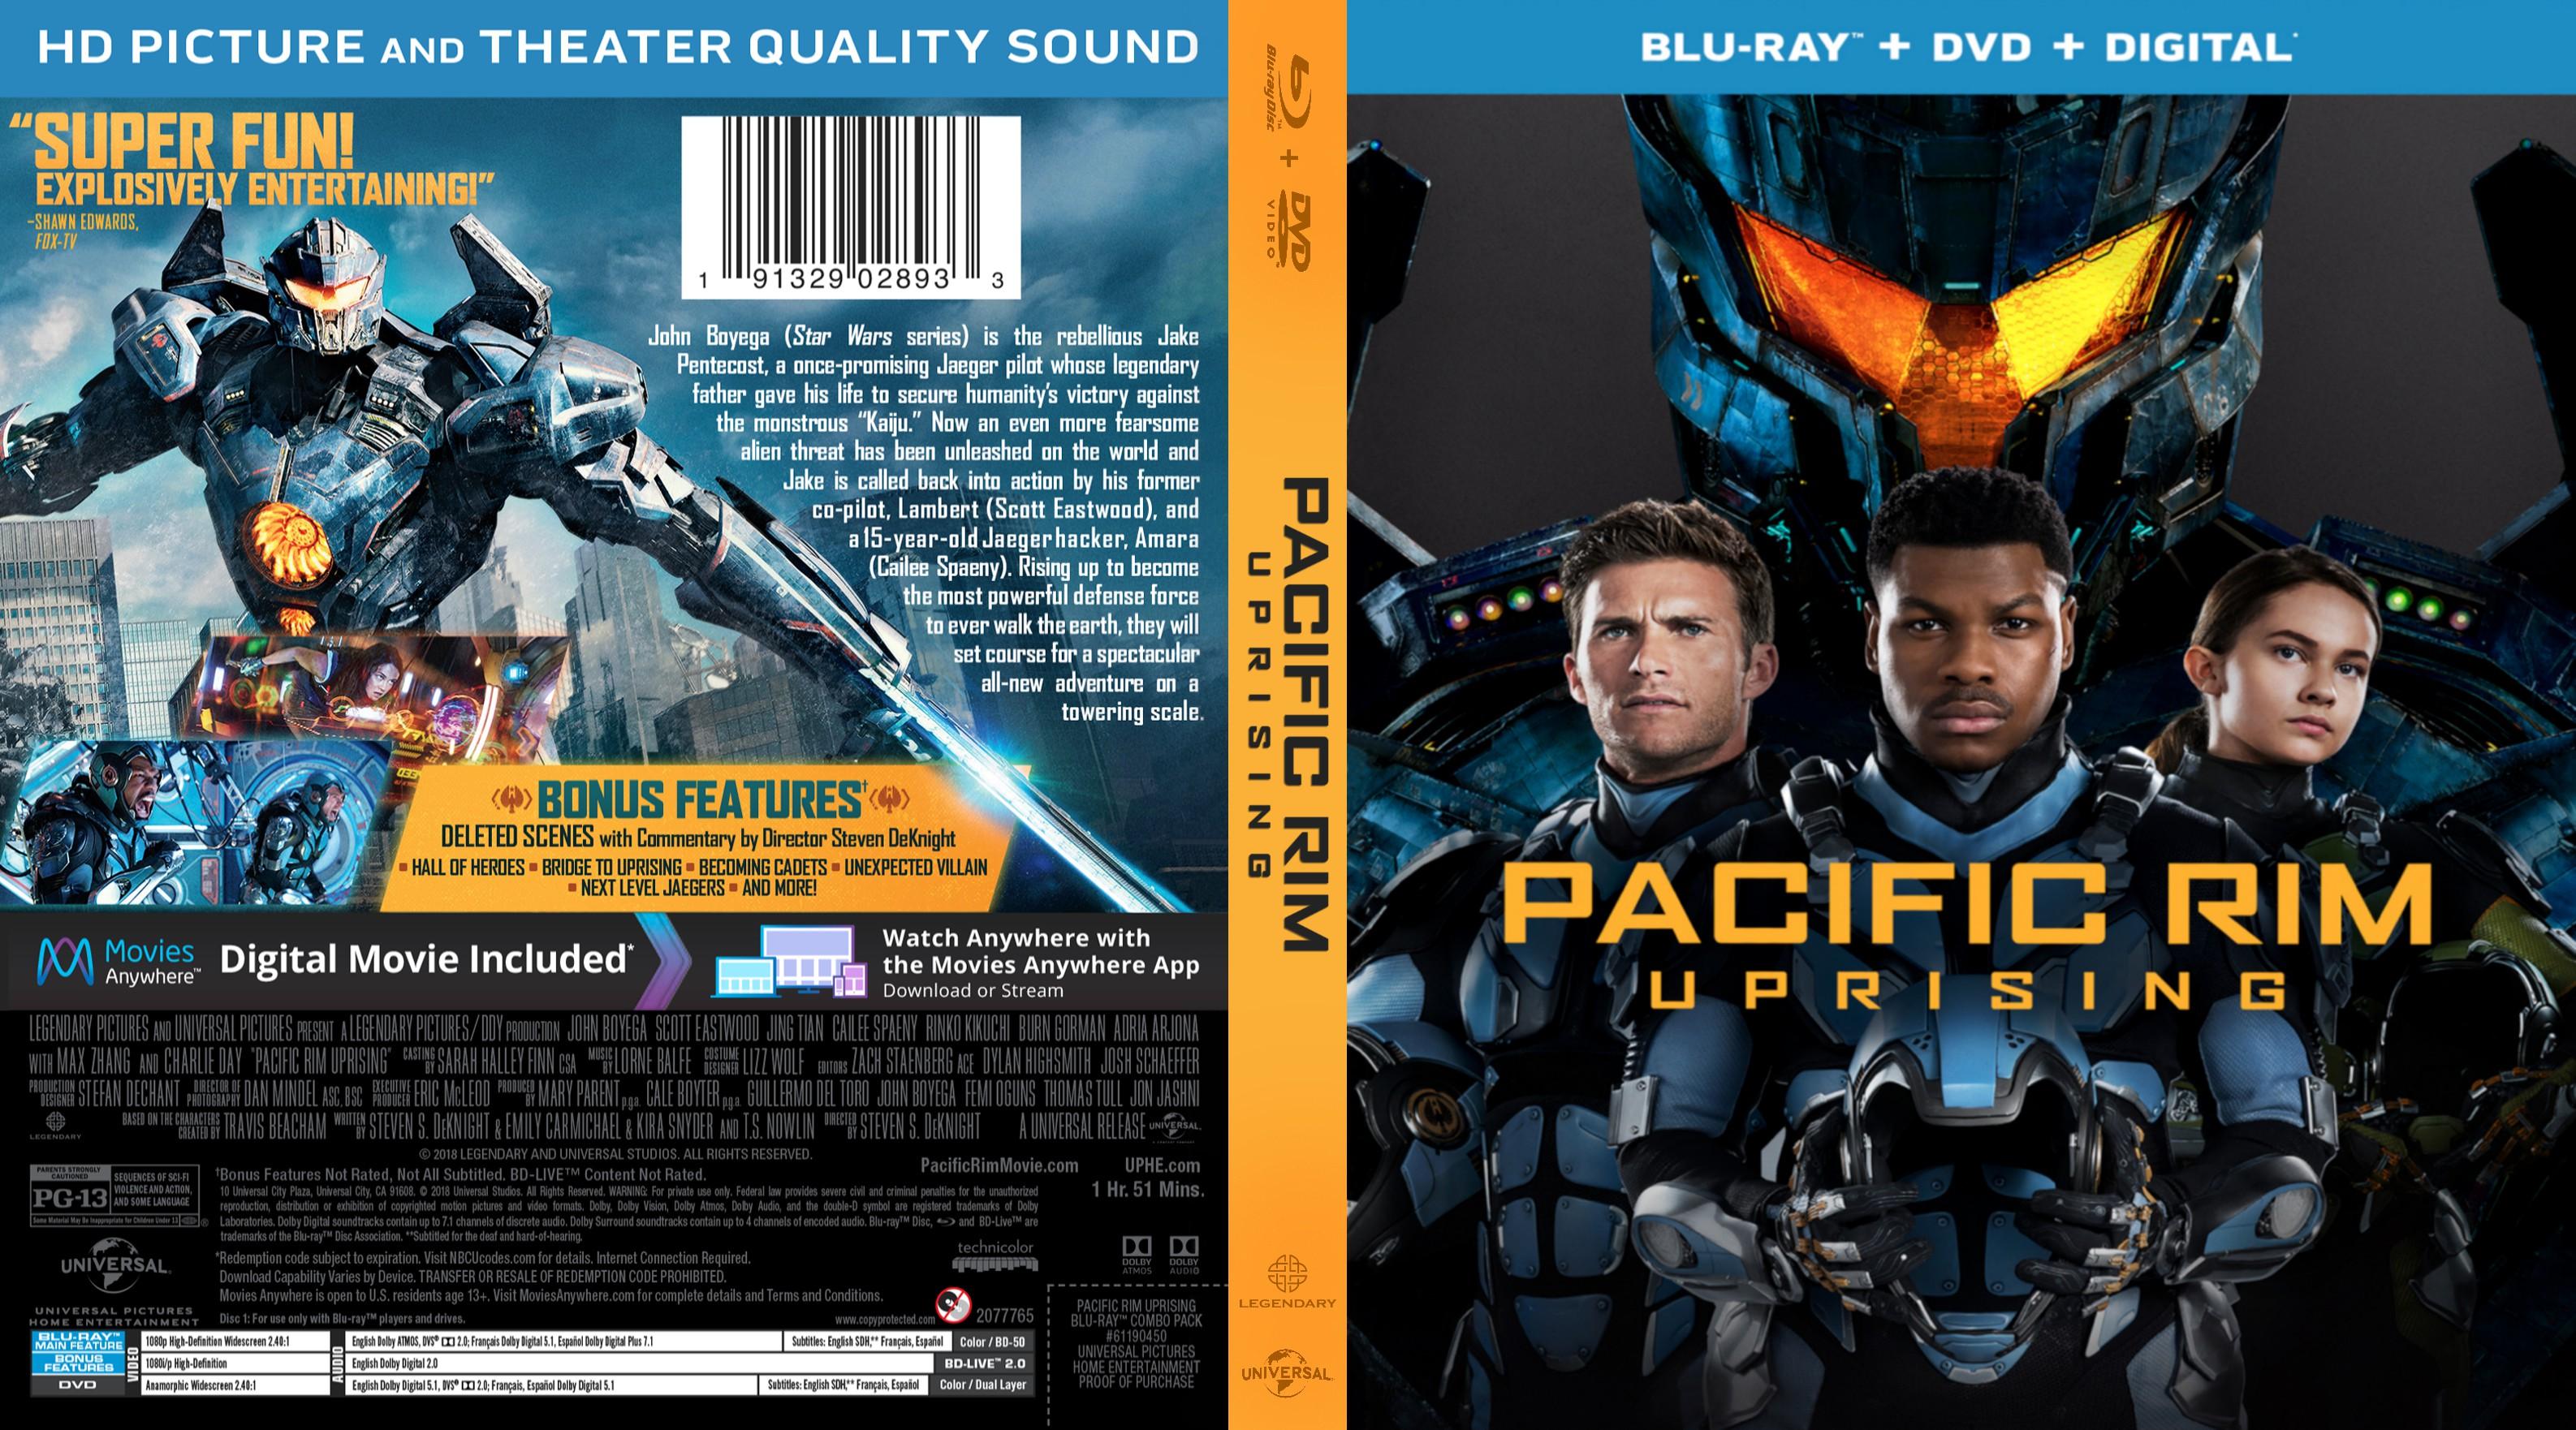 Pacific Rim Uprising (scan) Bluray Cover | Cover Addict ... Pacific Rim Dvd Cover